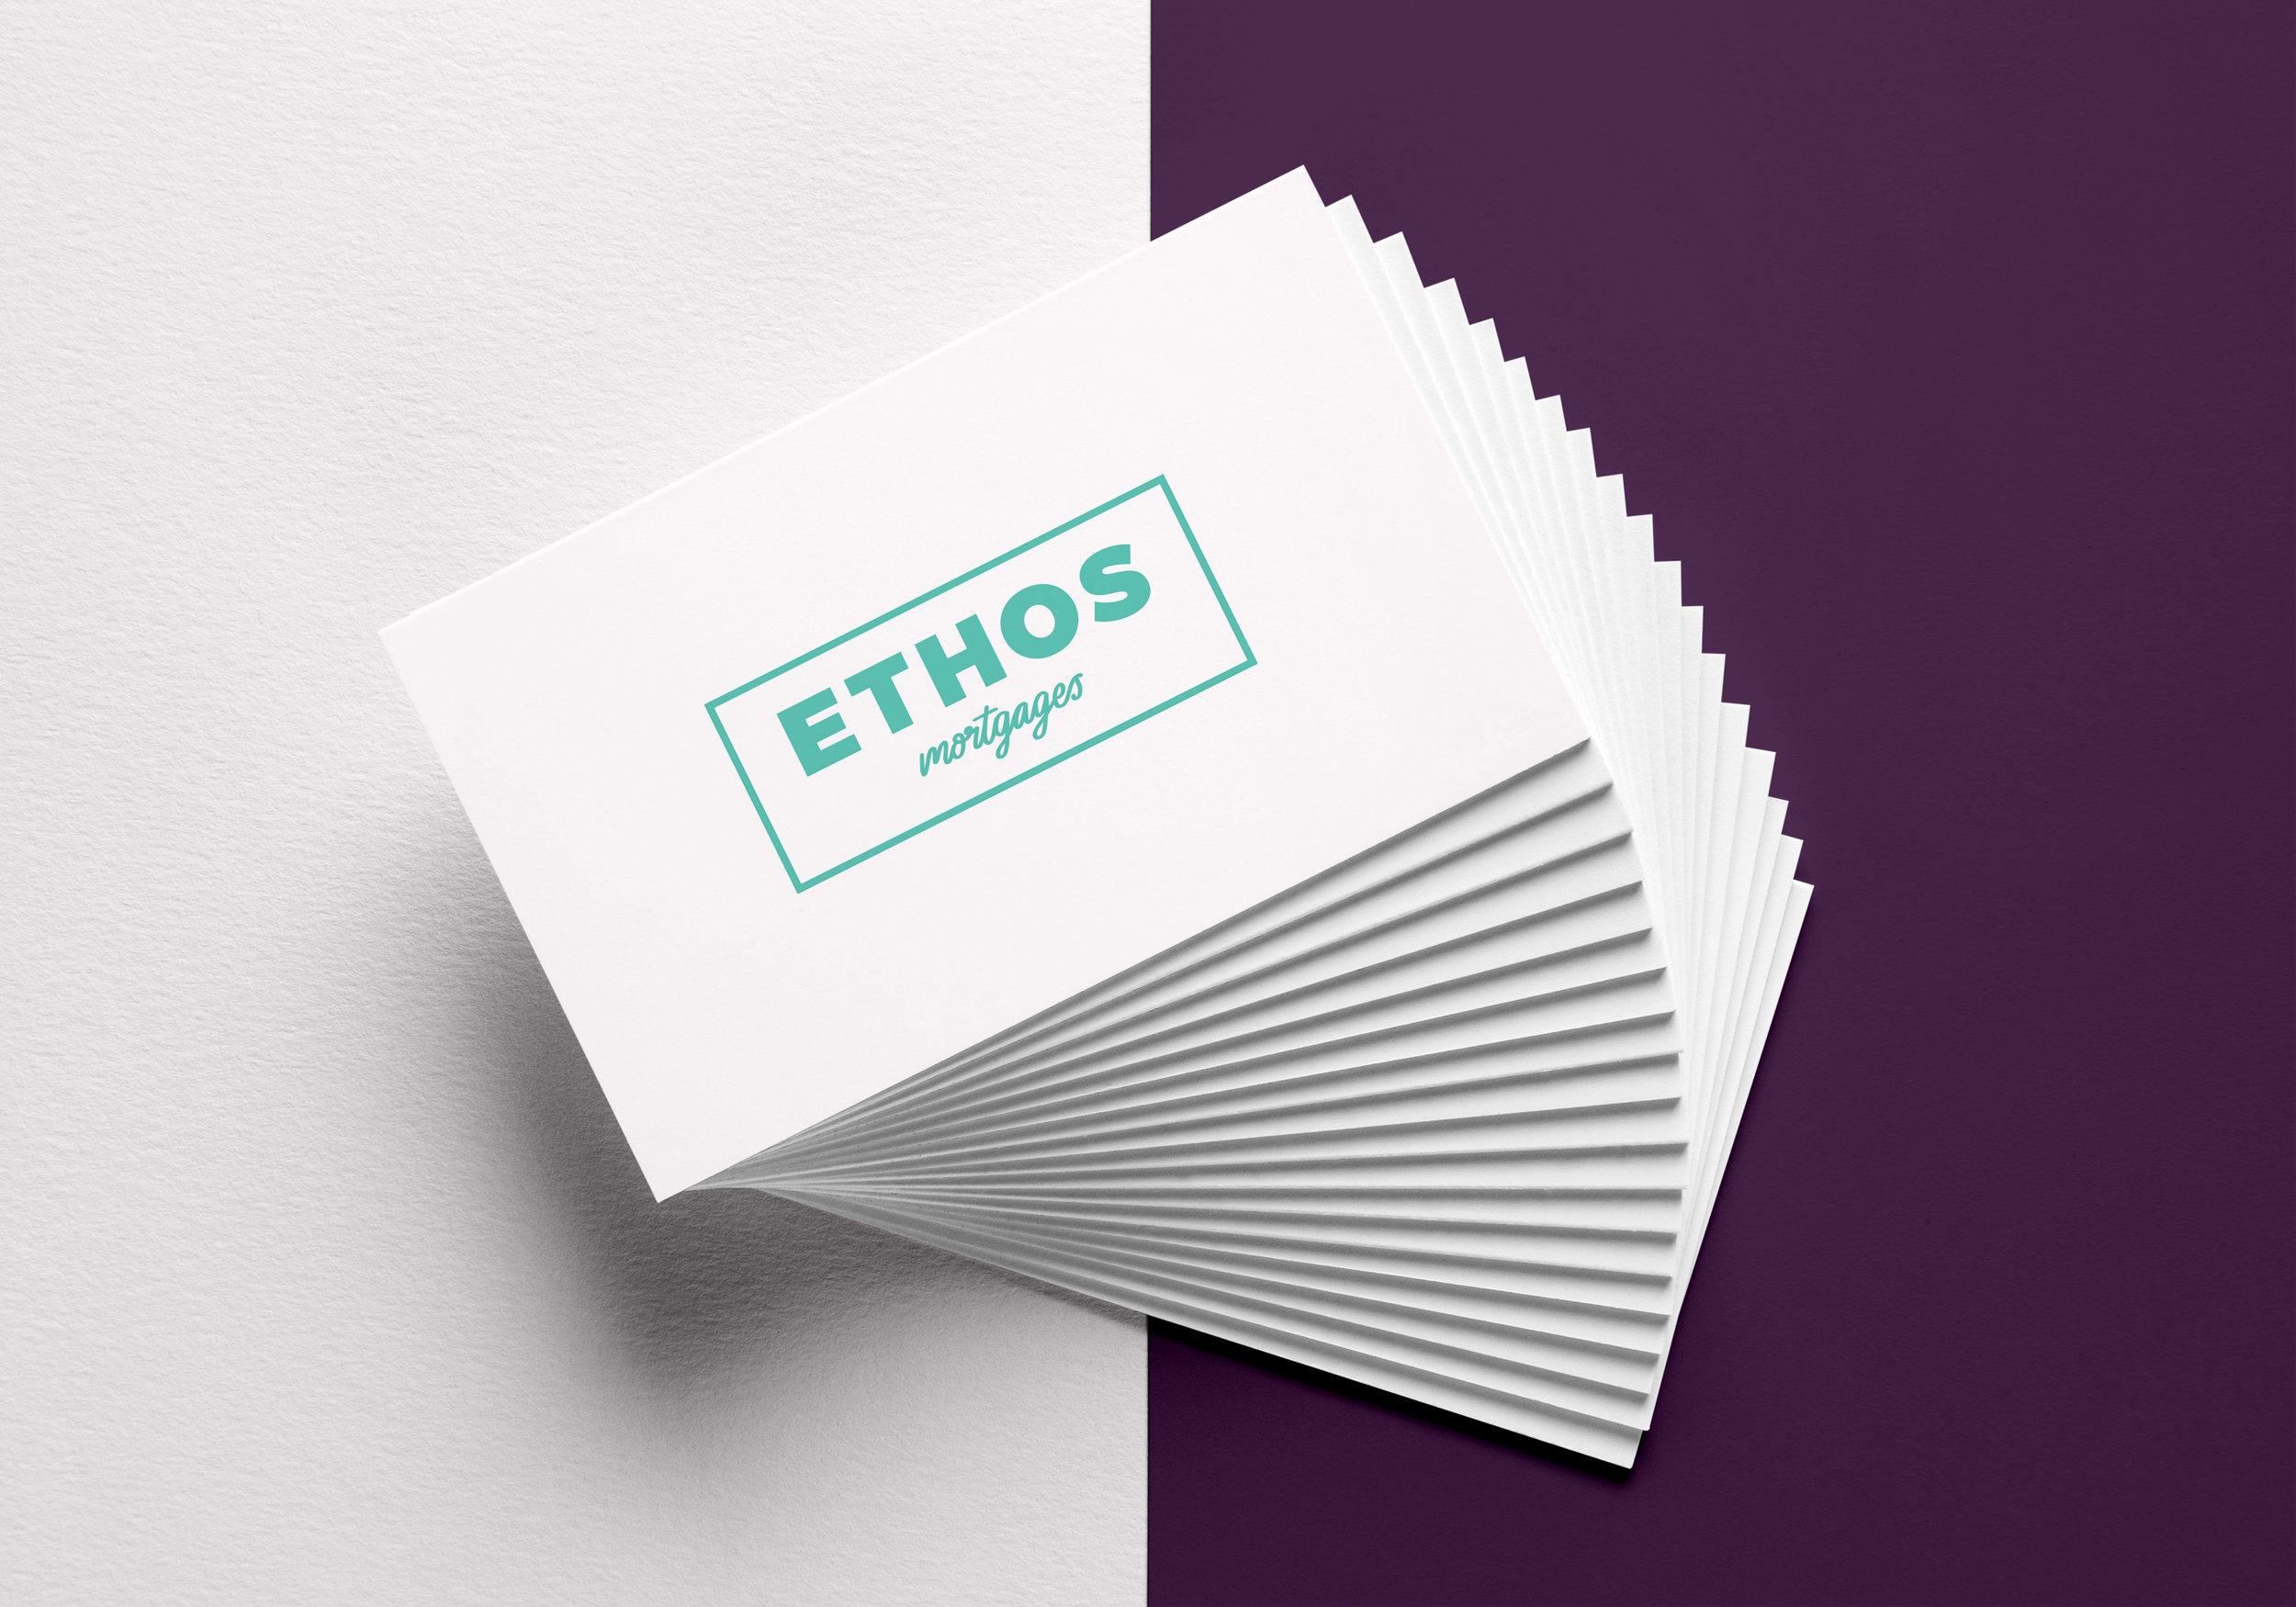 ethos-businesscards.jpg